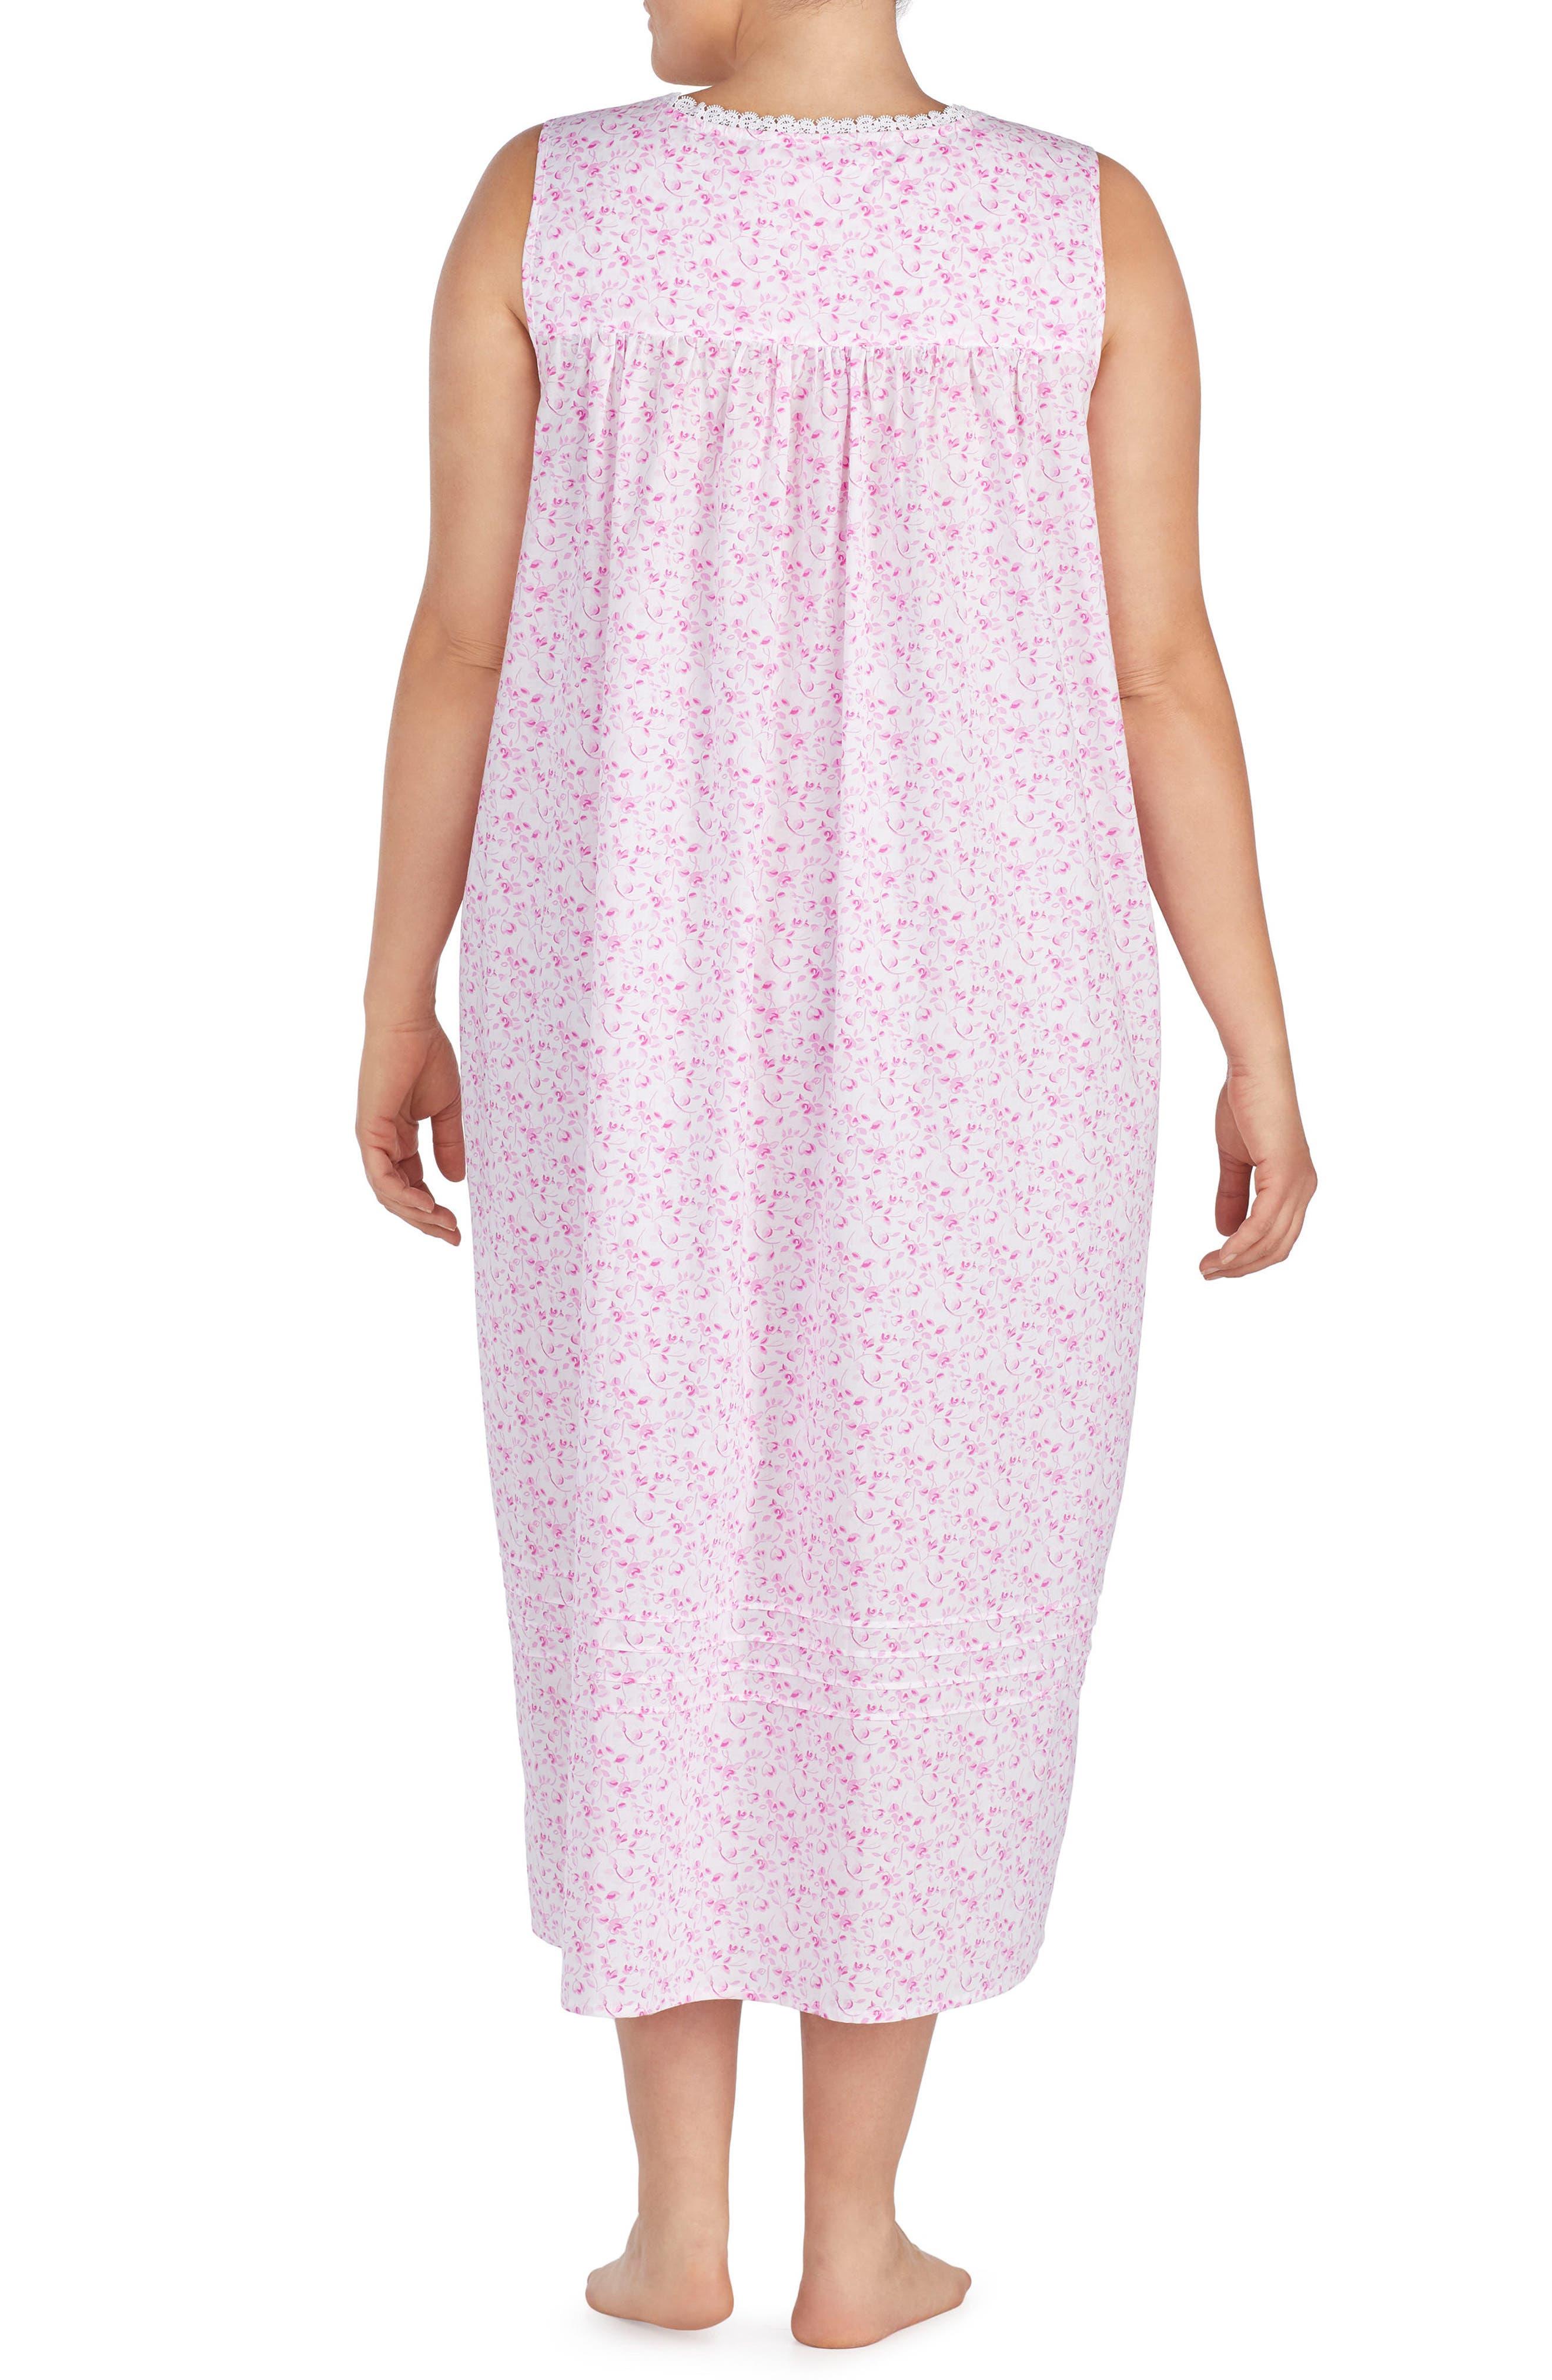 Cotton Lawn Ballet Nightgown,                             Alternate thumbnail 2, color,                             656